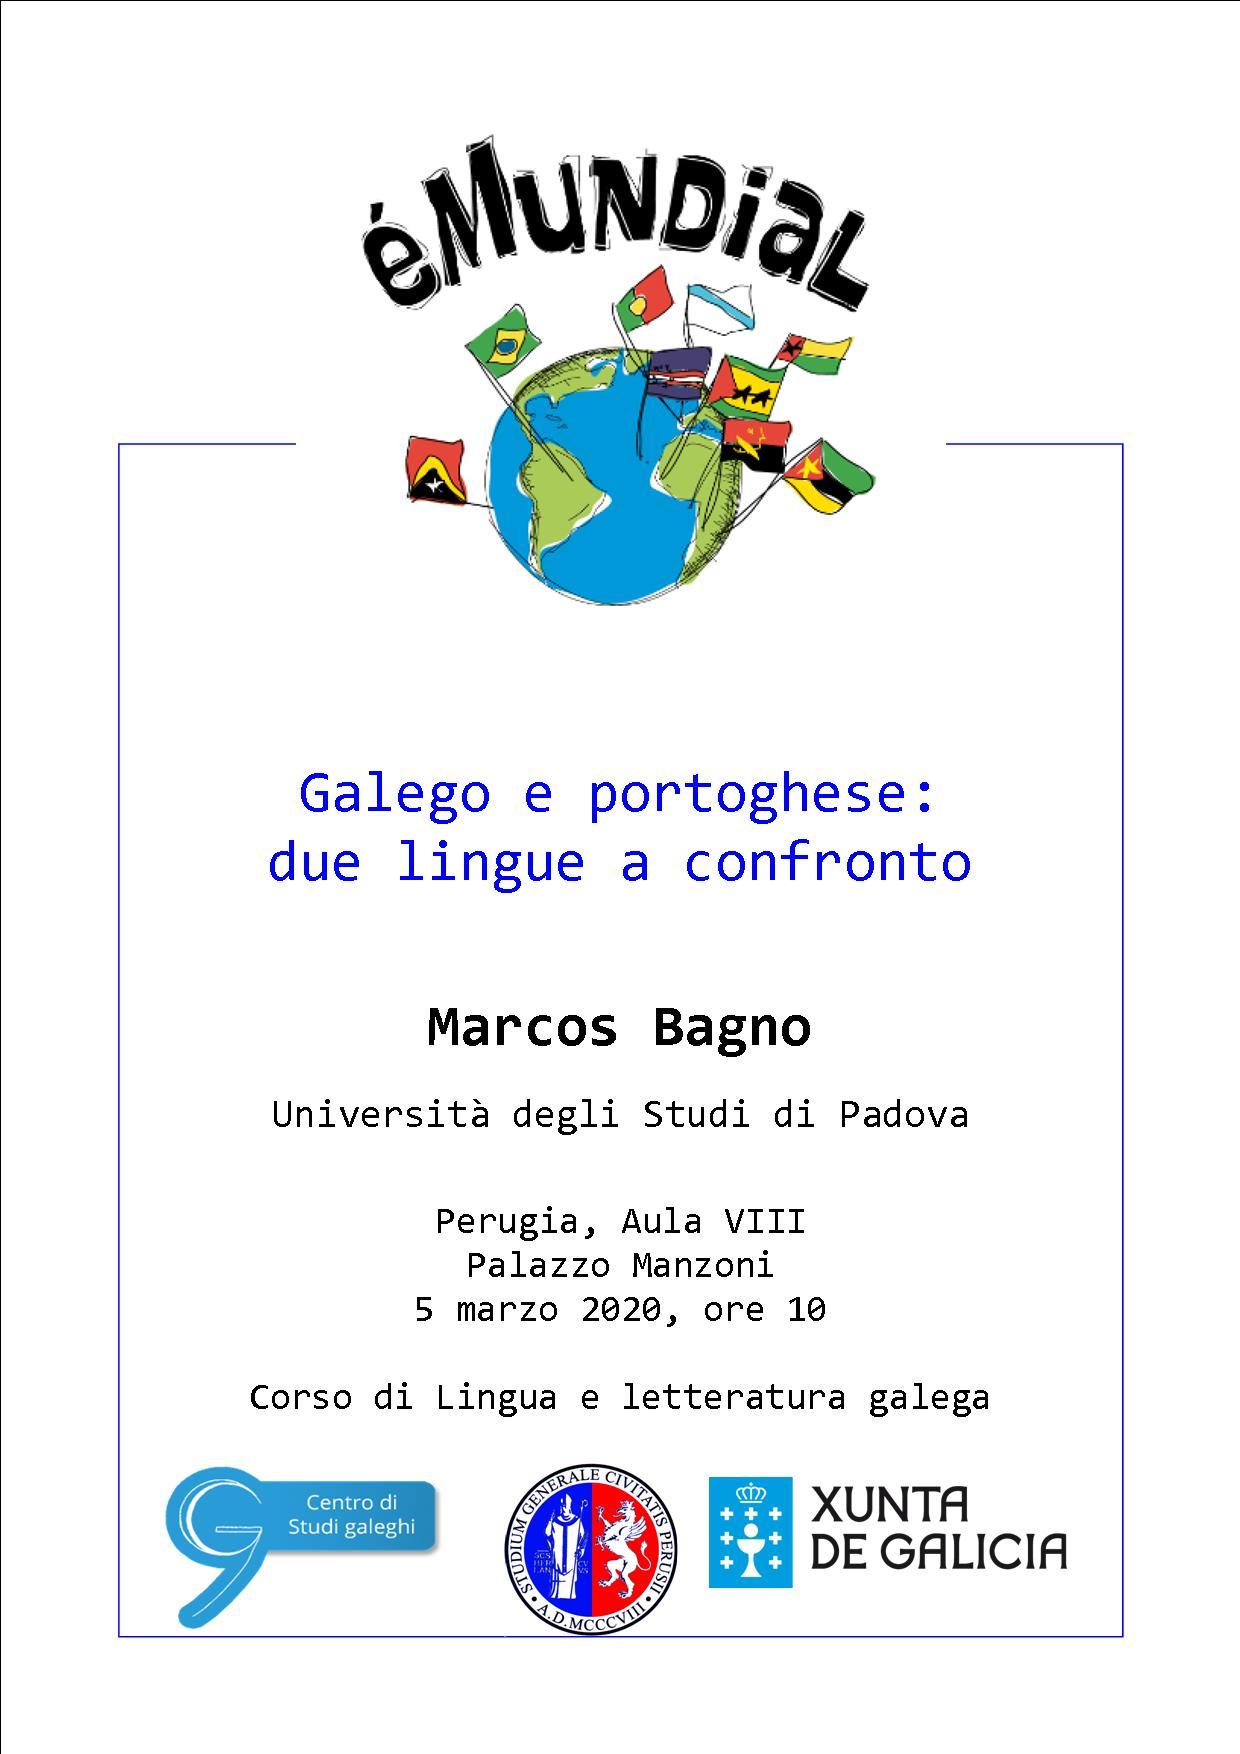 Conferenza di Marcos Bagno